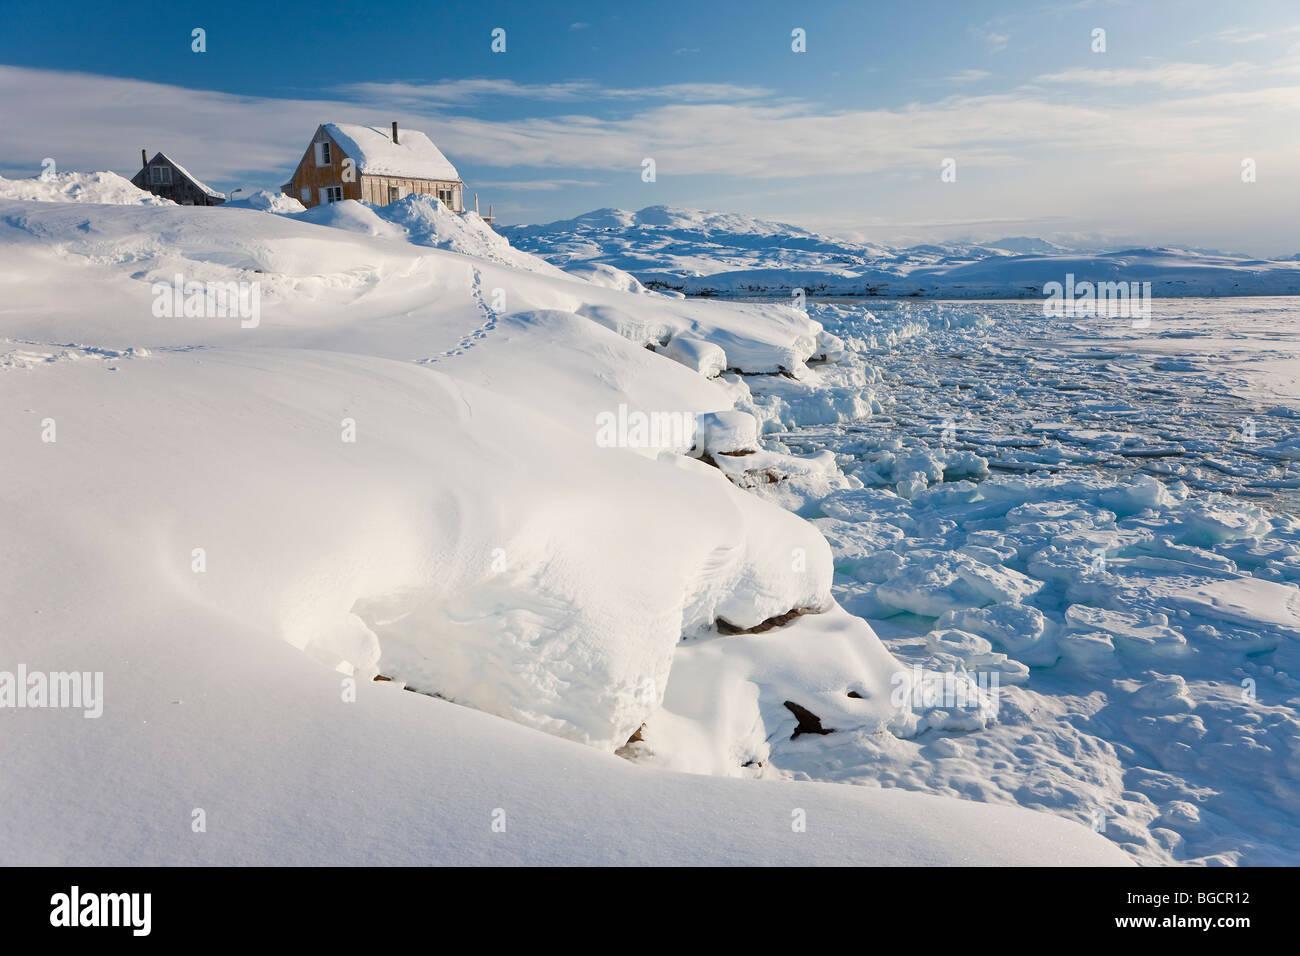 House on edge of fjord, Tiniteqilaq, Greenland - Stock Image